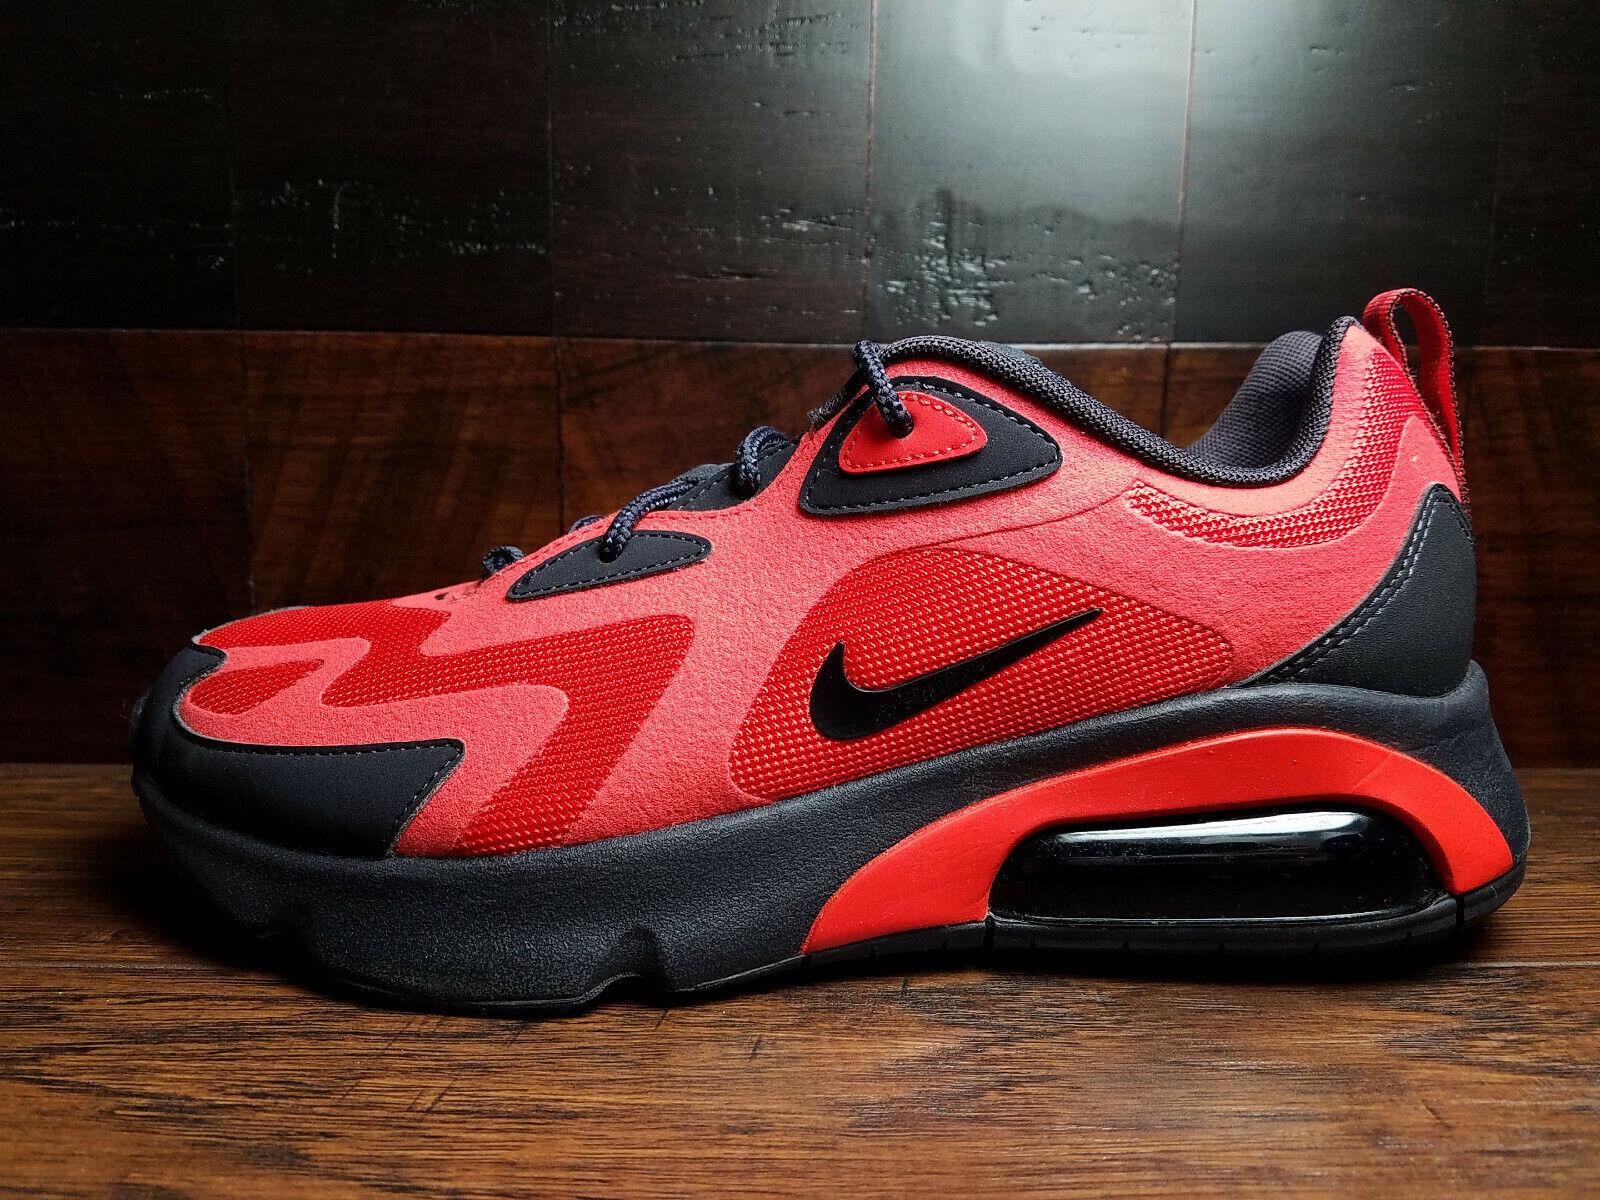 En marcha temblor Conejo  Mens Nike Air Max 98 AOP Trainers Tiger Camo Size UK 11 US 12 EUR 46  Aq4130-200 for sale online | eBay